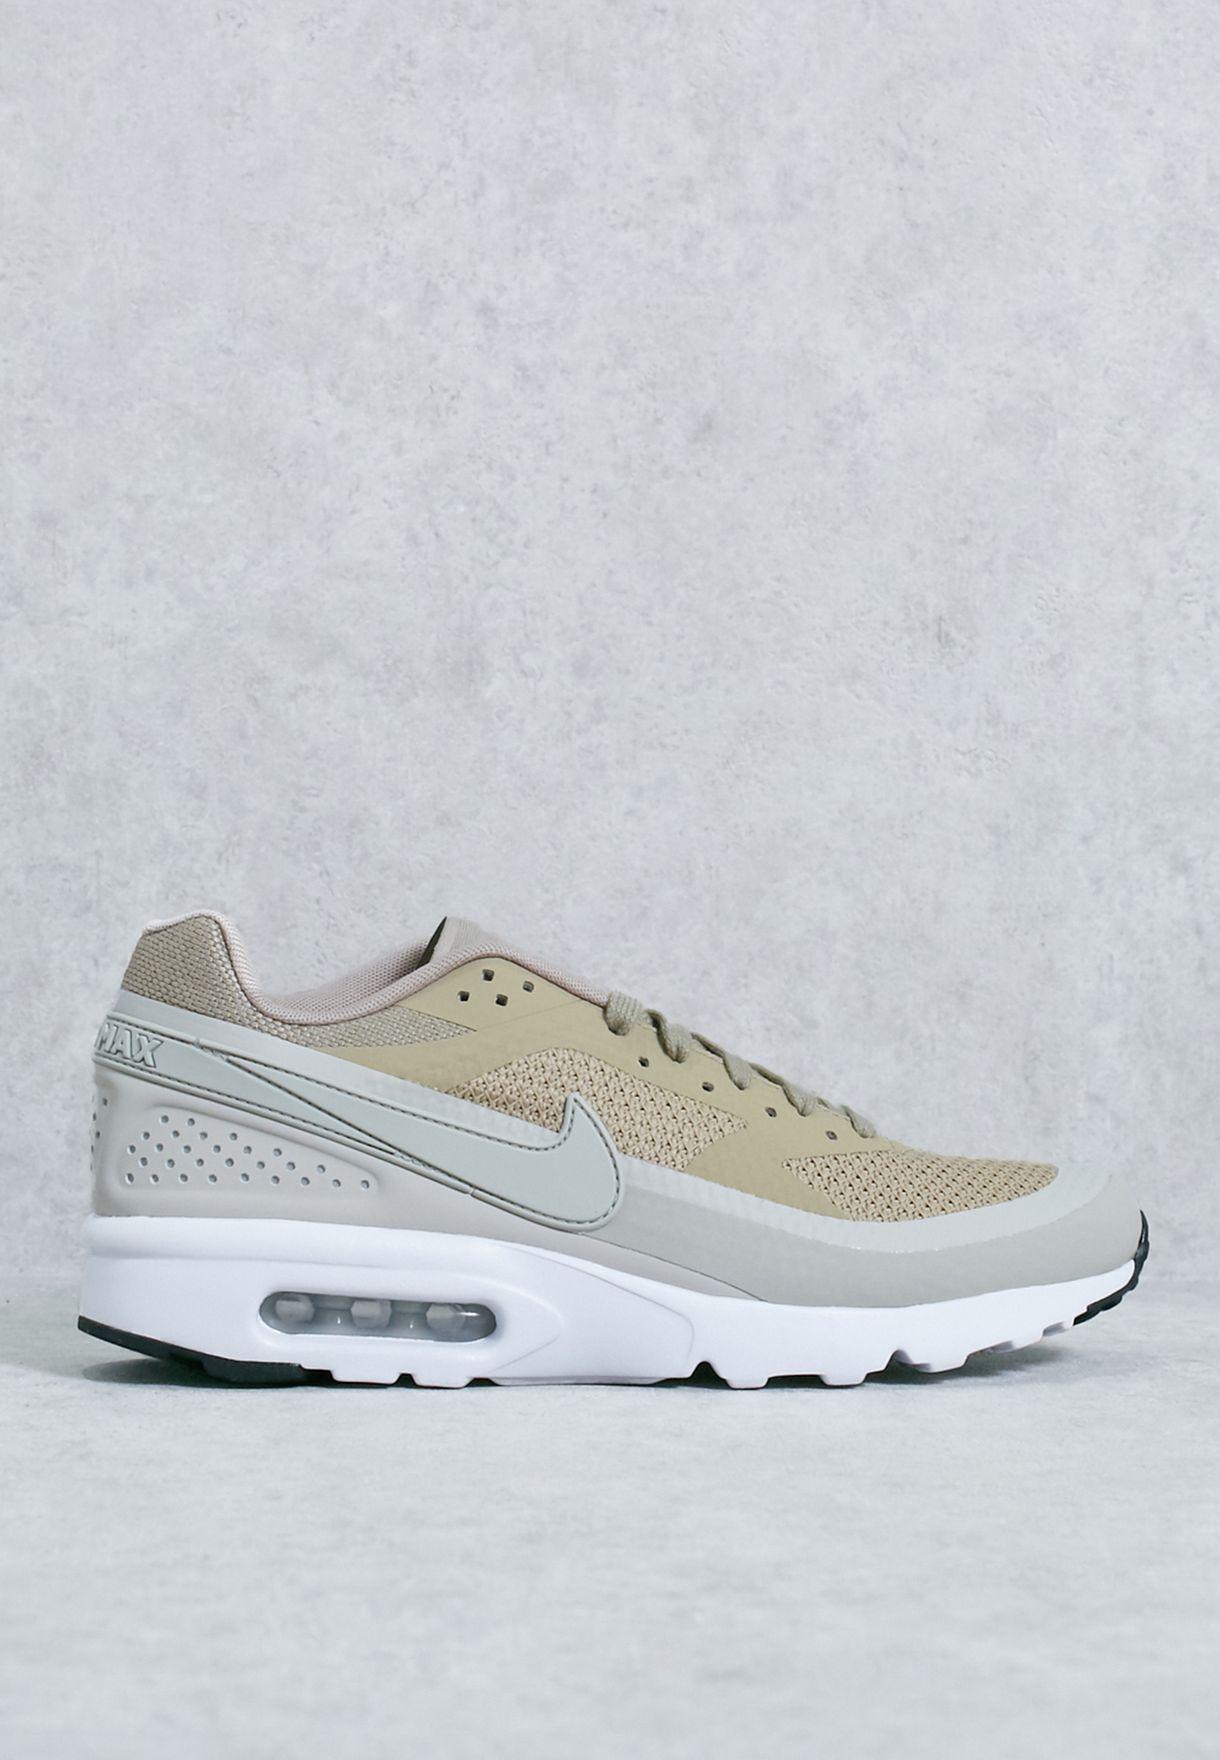 Nike Air Max BW Ultra W chaussures beige blanc dans le shop